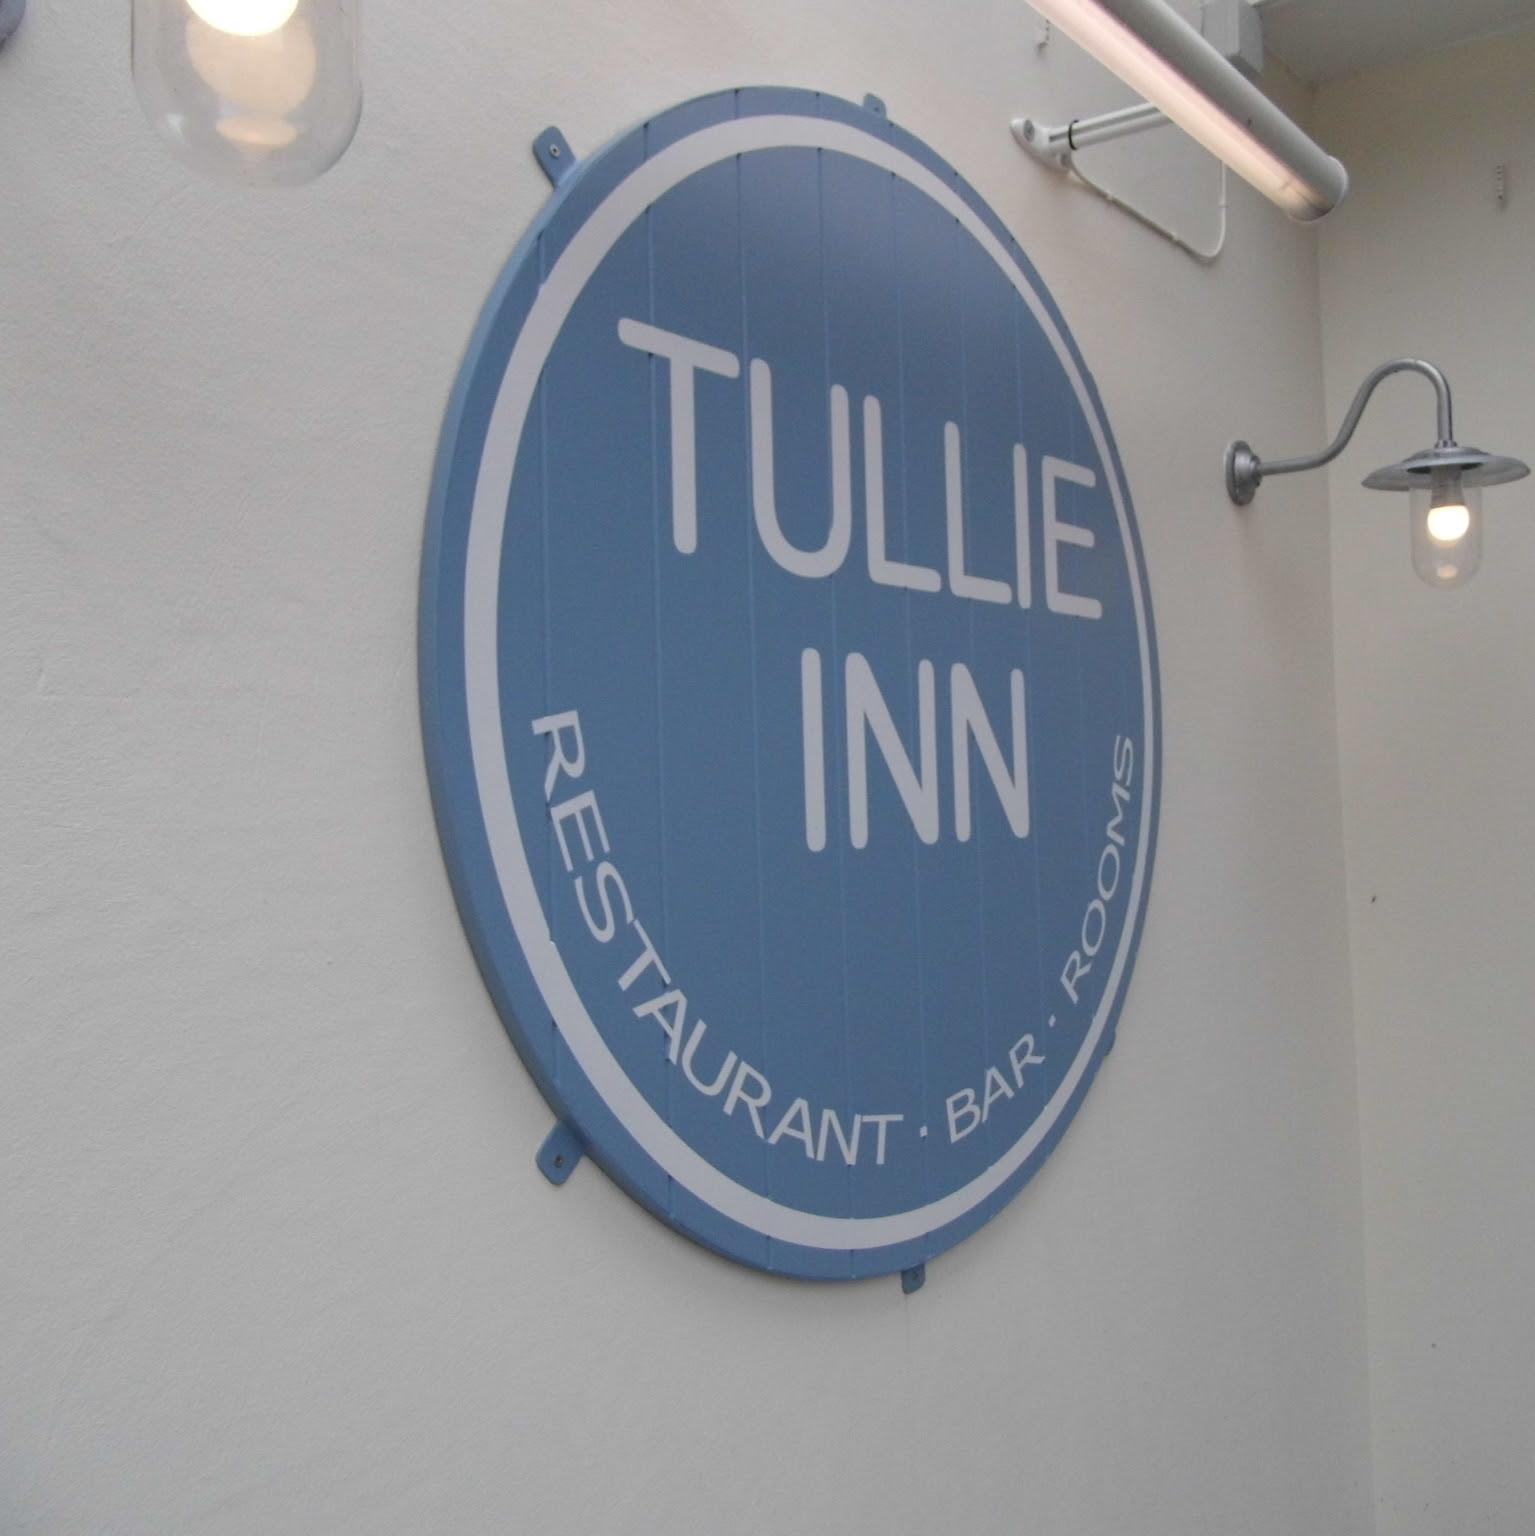 Tuillie Inn Balloch